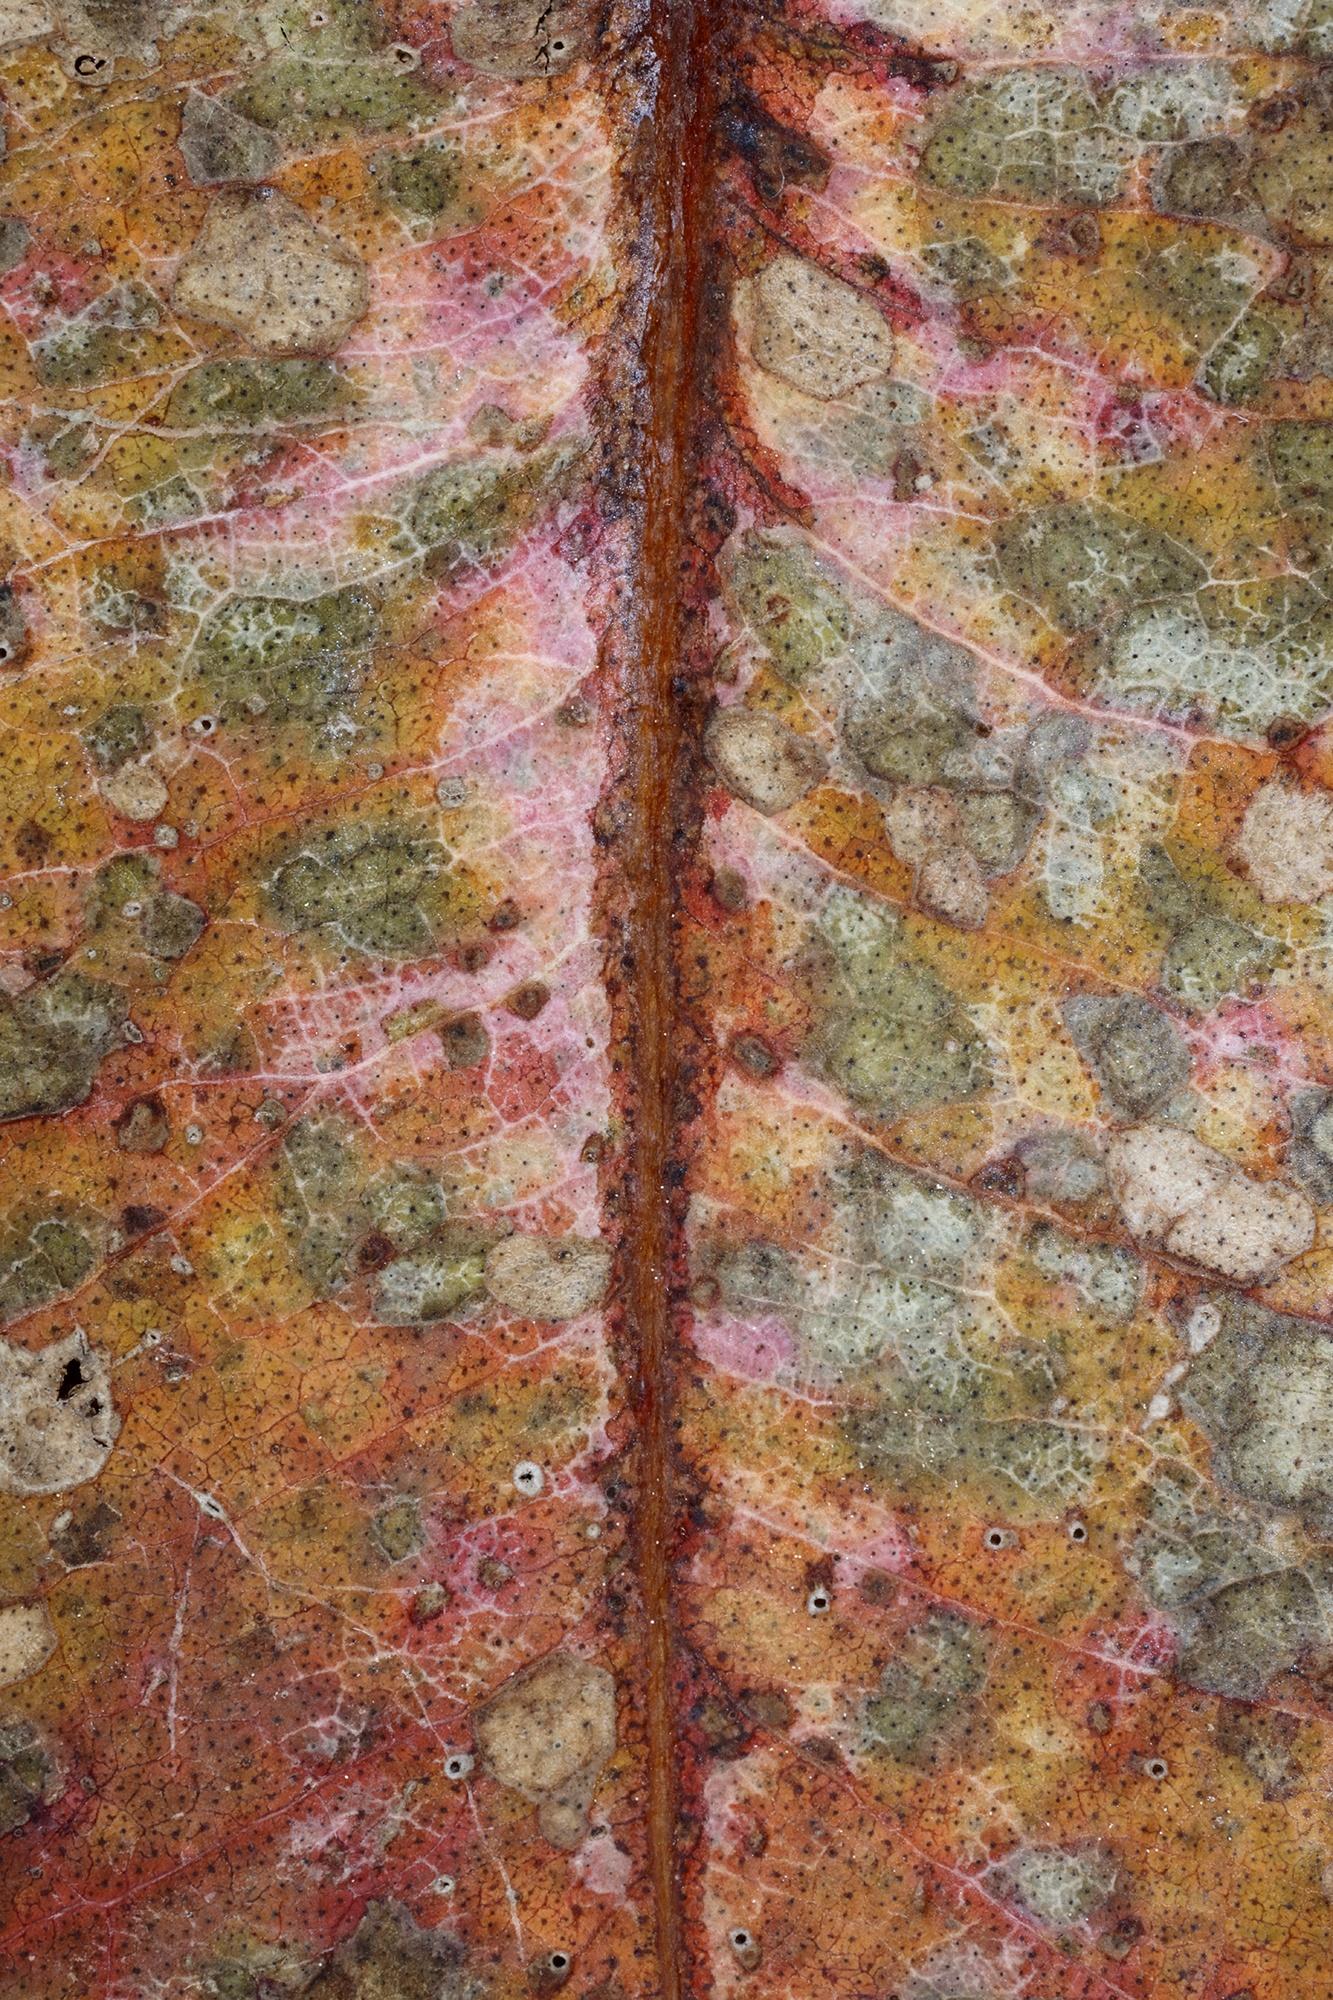 Mors folium II - The Beauty of Senescence II